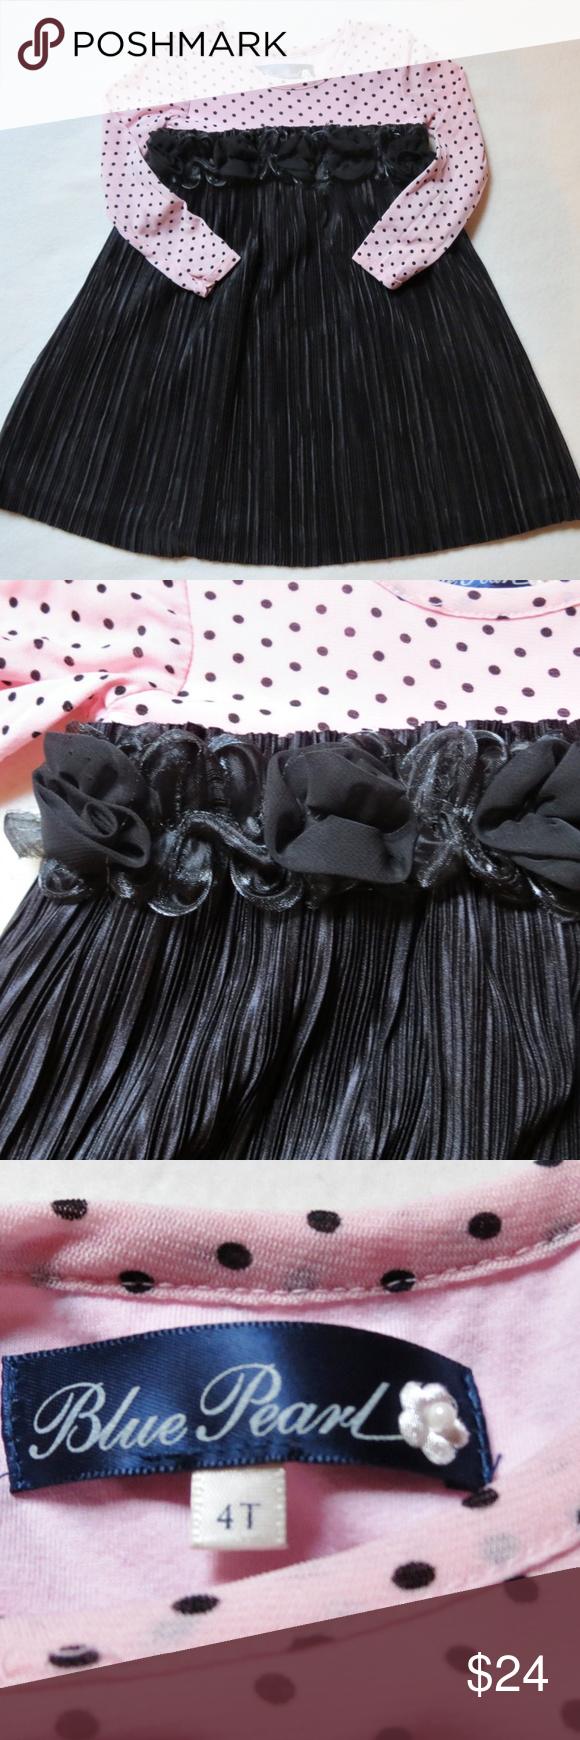 Mulberri Bush Blue Pearl Chelsea Dress Sz 4t Black And Pink Dress Girls Blue Dress Little Girl Pageant Dresses [ 1740 x 580 Pixel ]